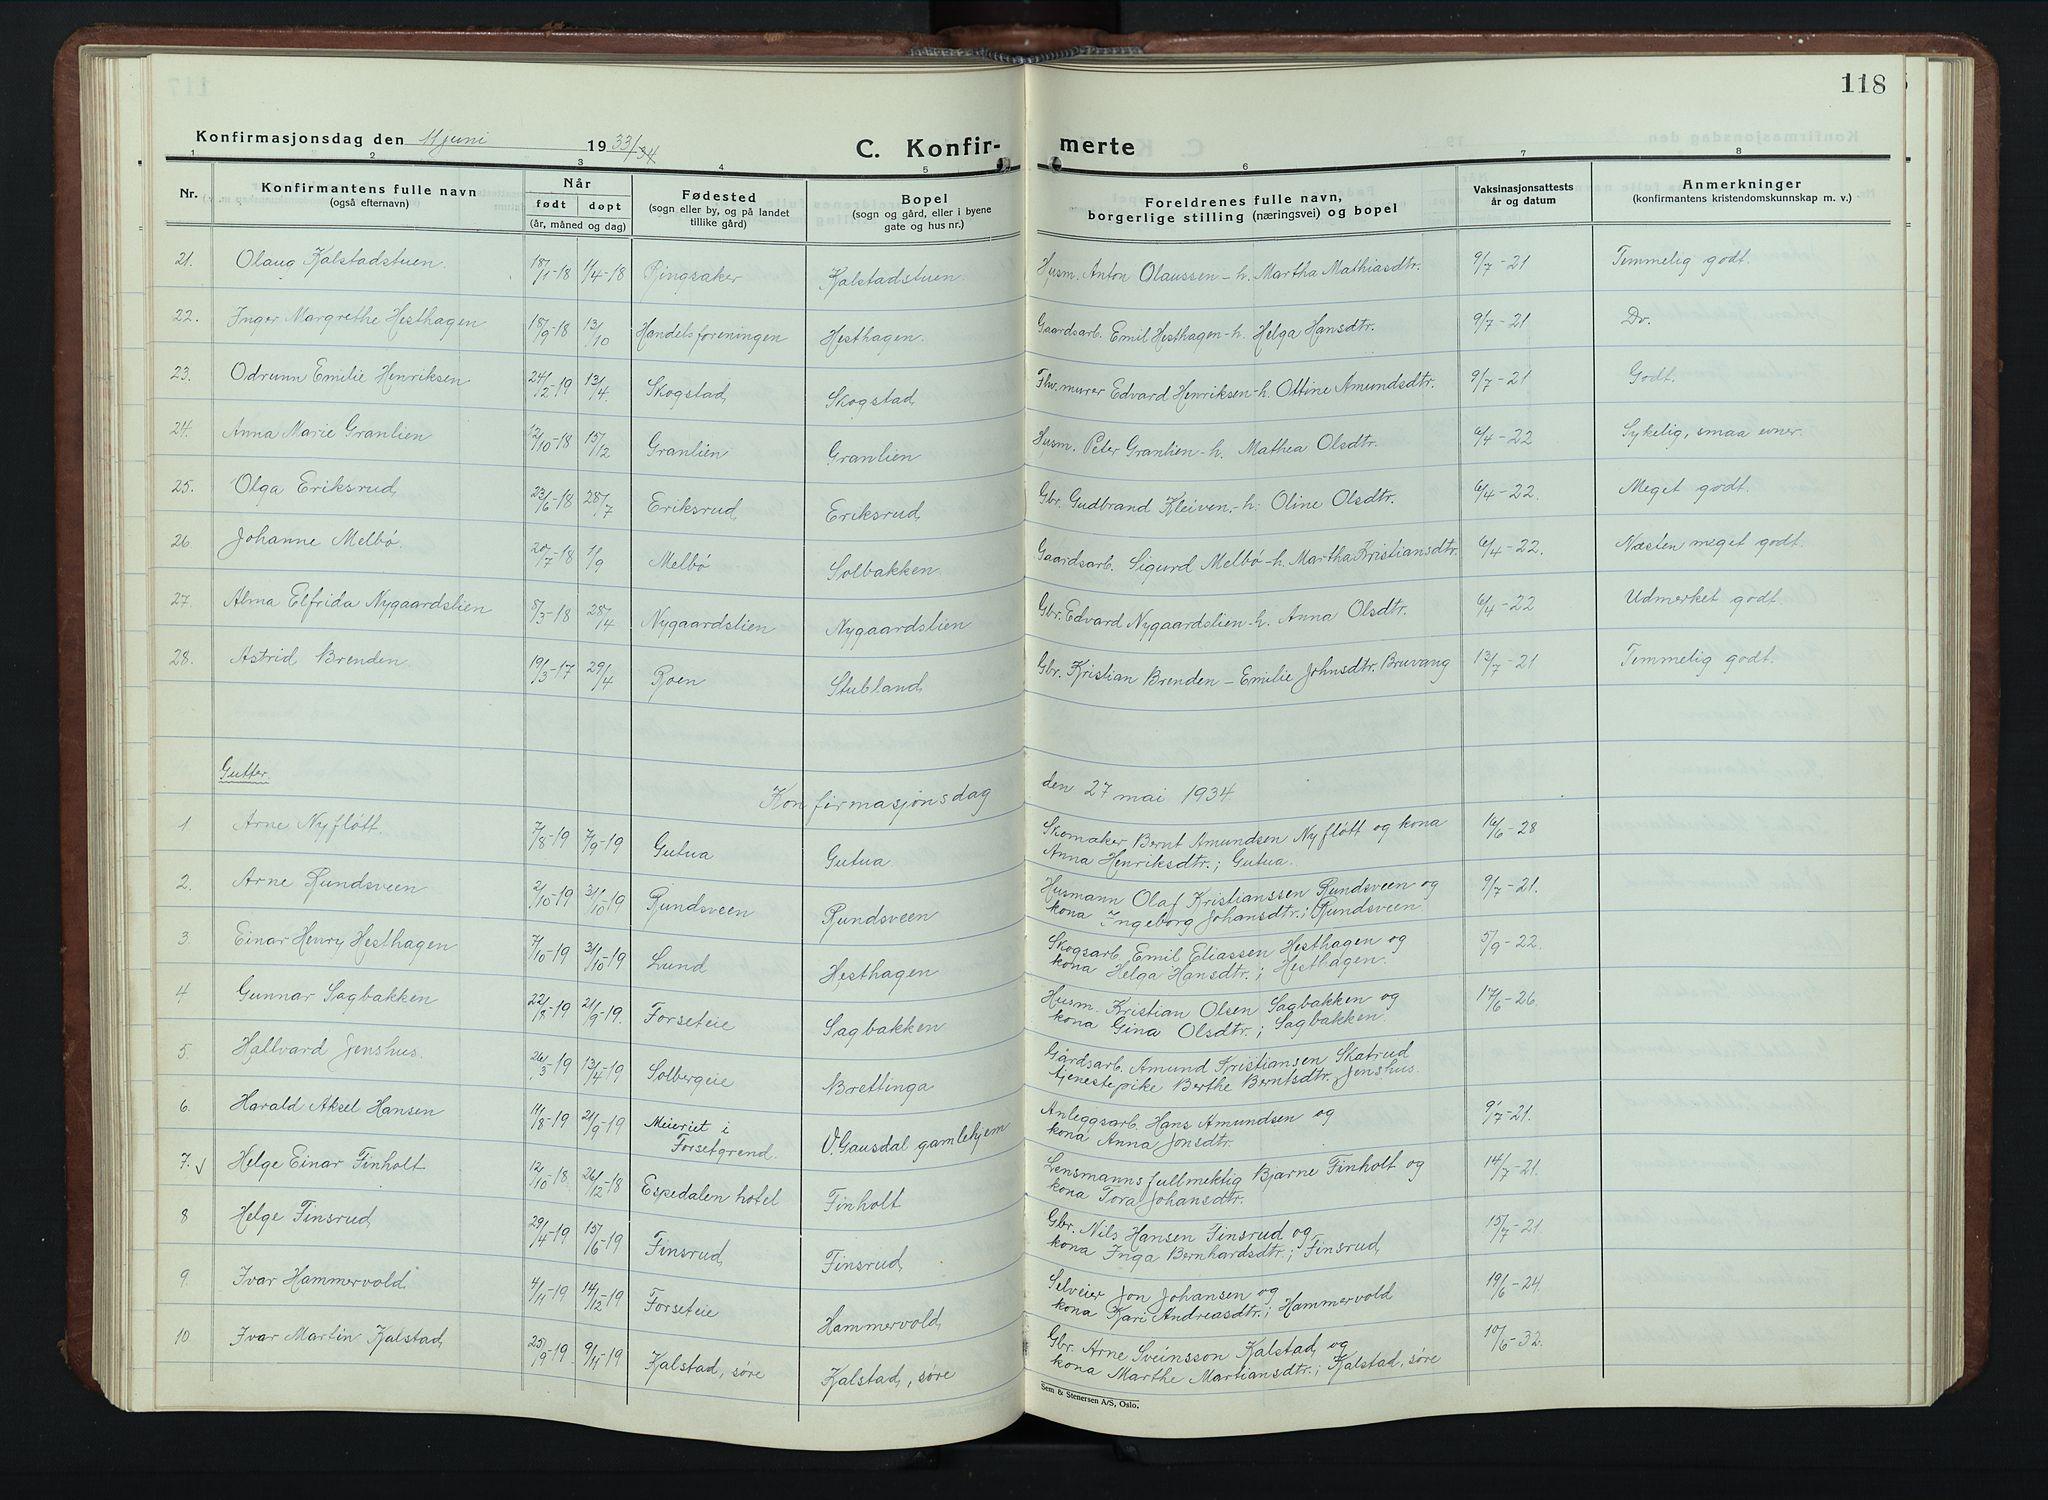 SAH, Vestre Gausdal prestekontor, Klokkerbok nr. 5, 1926-1955, s. 118